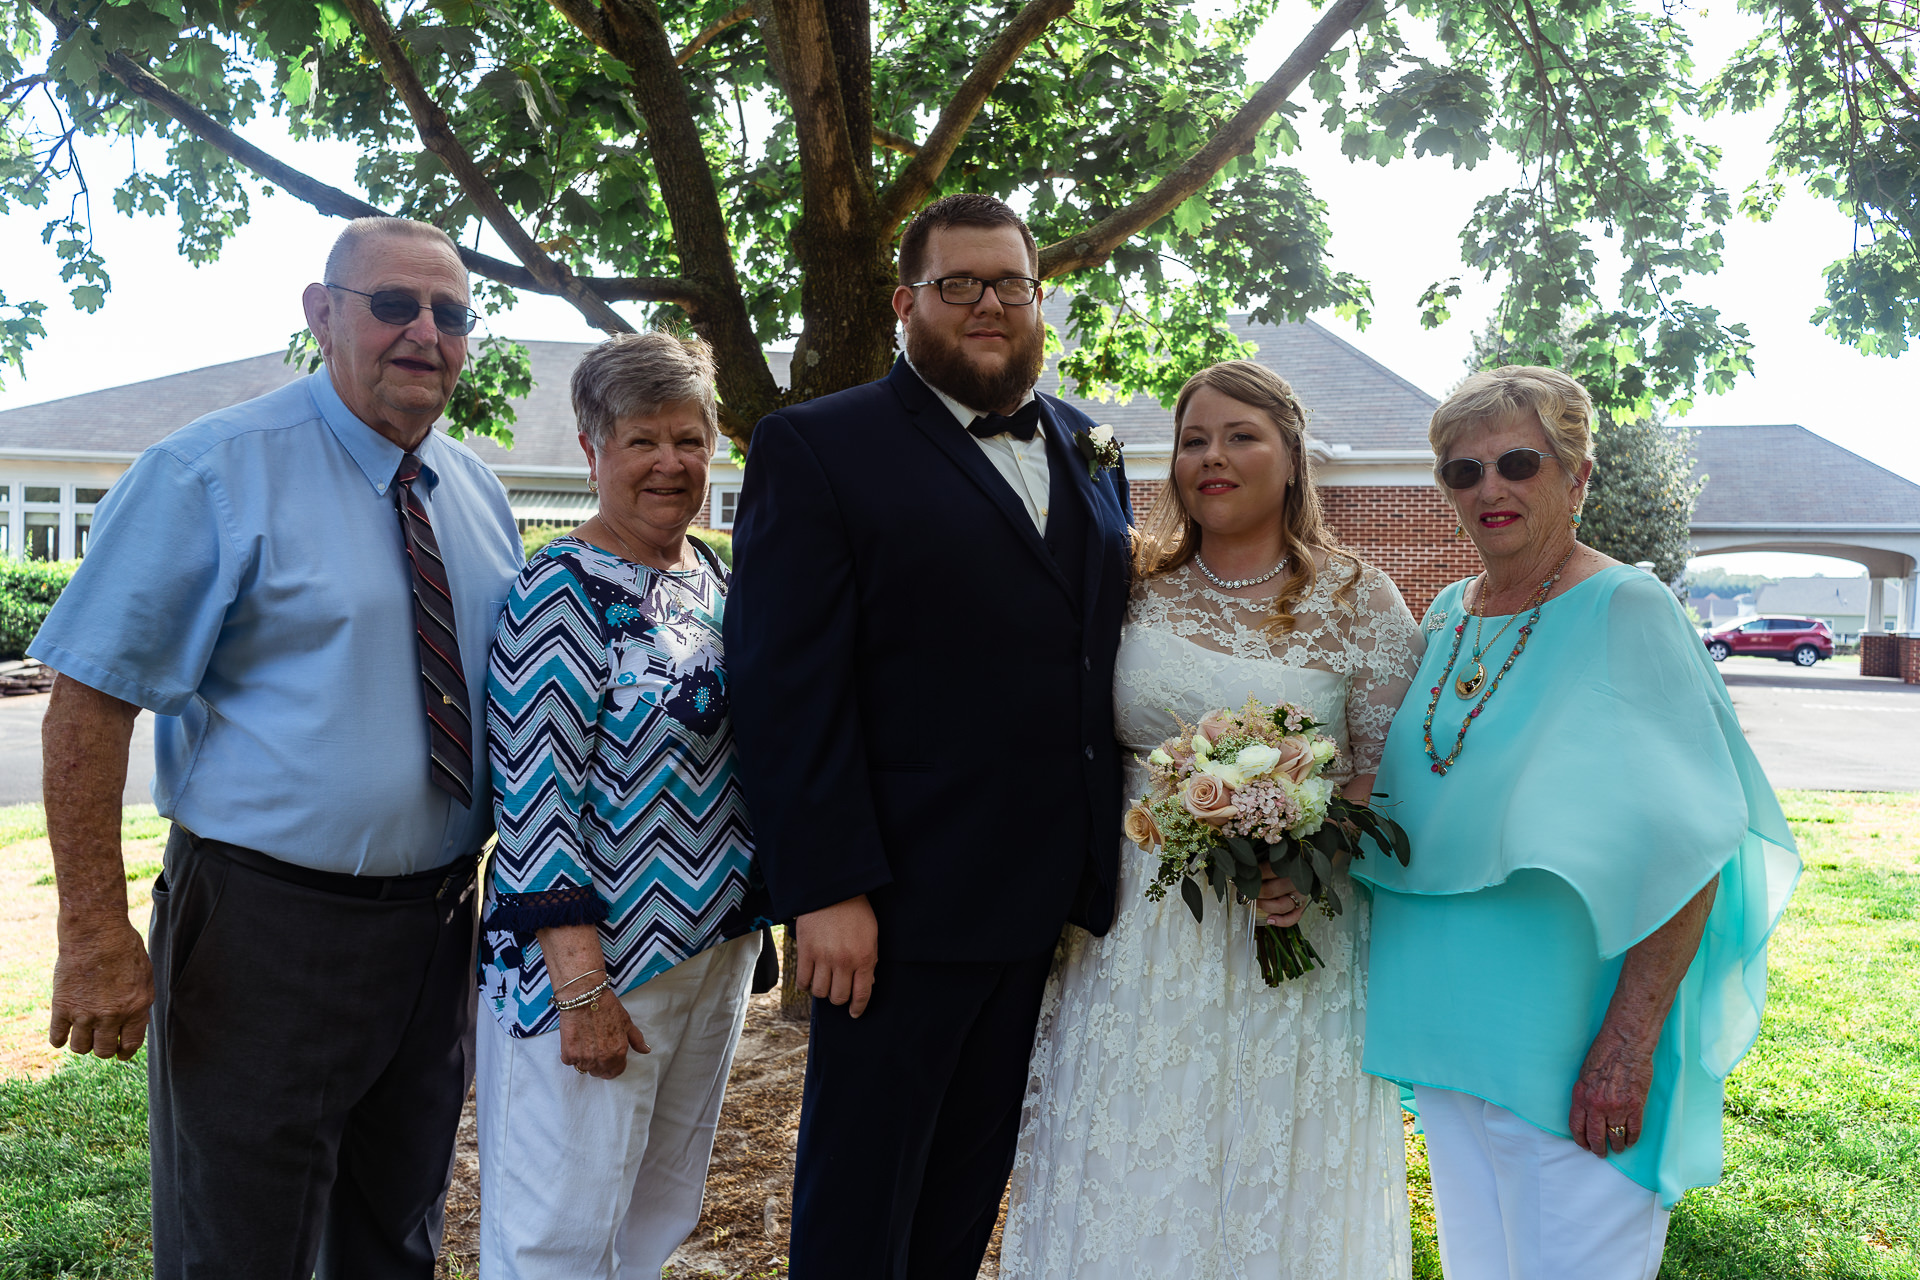 Warrington_Wedding (64 of 181).JPG